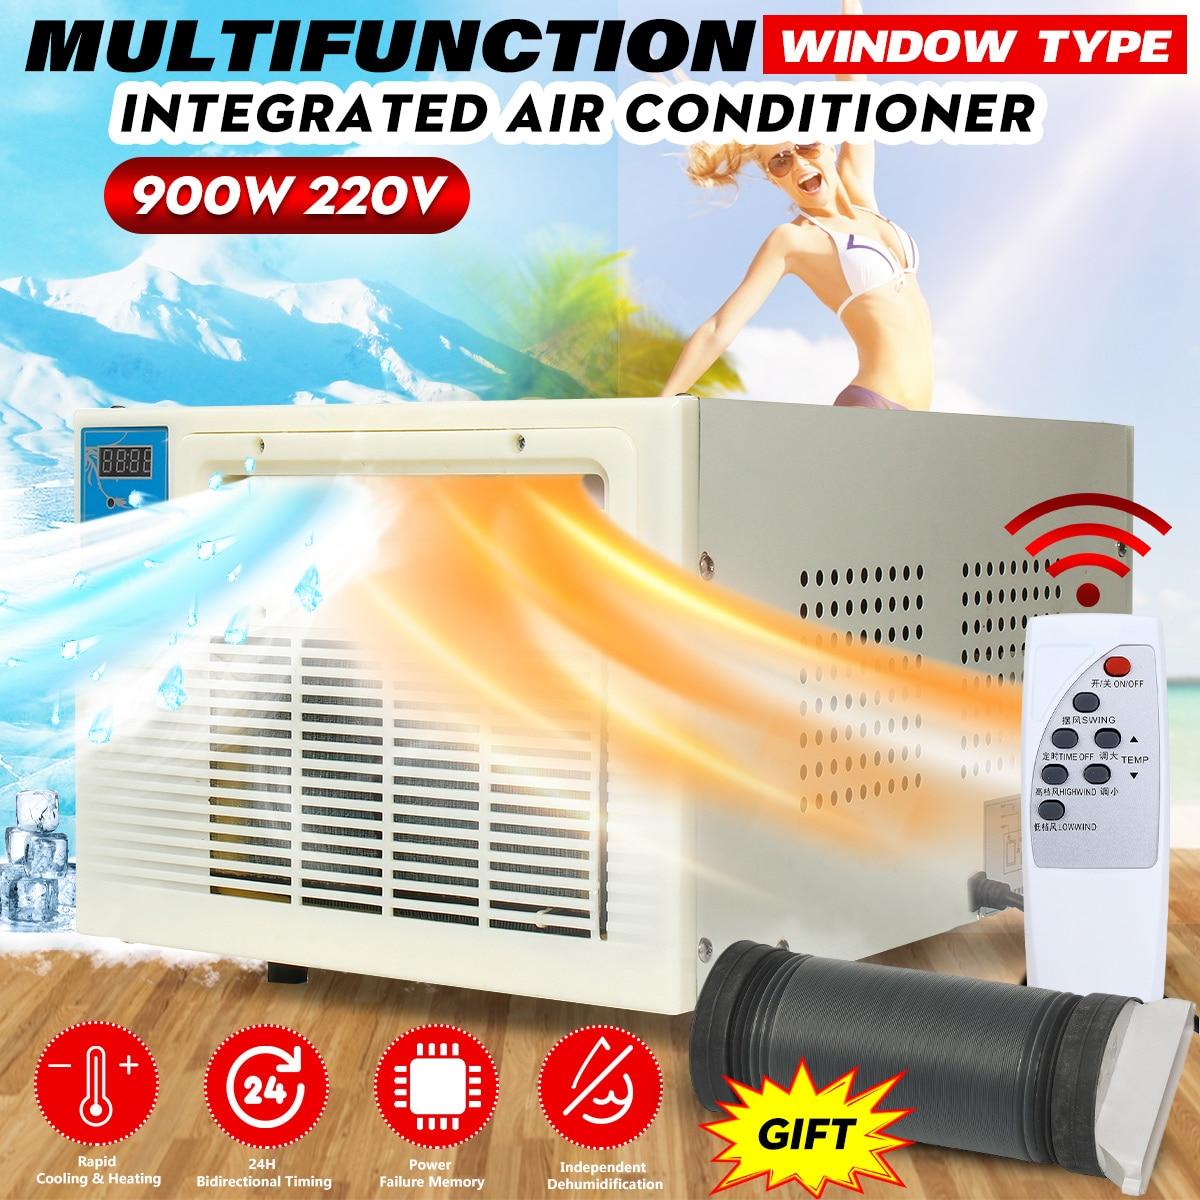 New Arrival 2019 600W Portable Air Conditioner Window Portable Air Conditioner Heater Cooling Cooler Cold/Heat 220V Dehumidifier